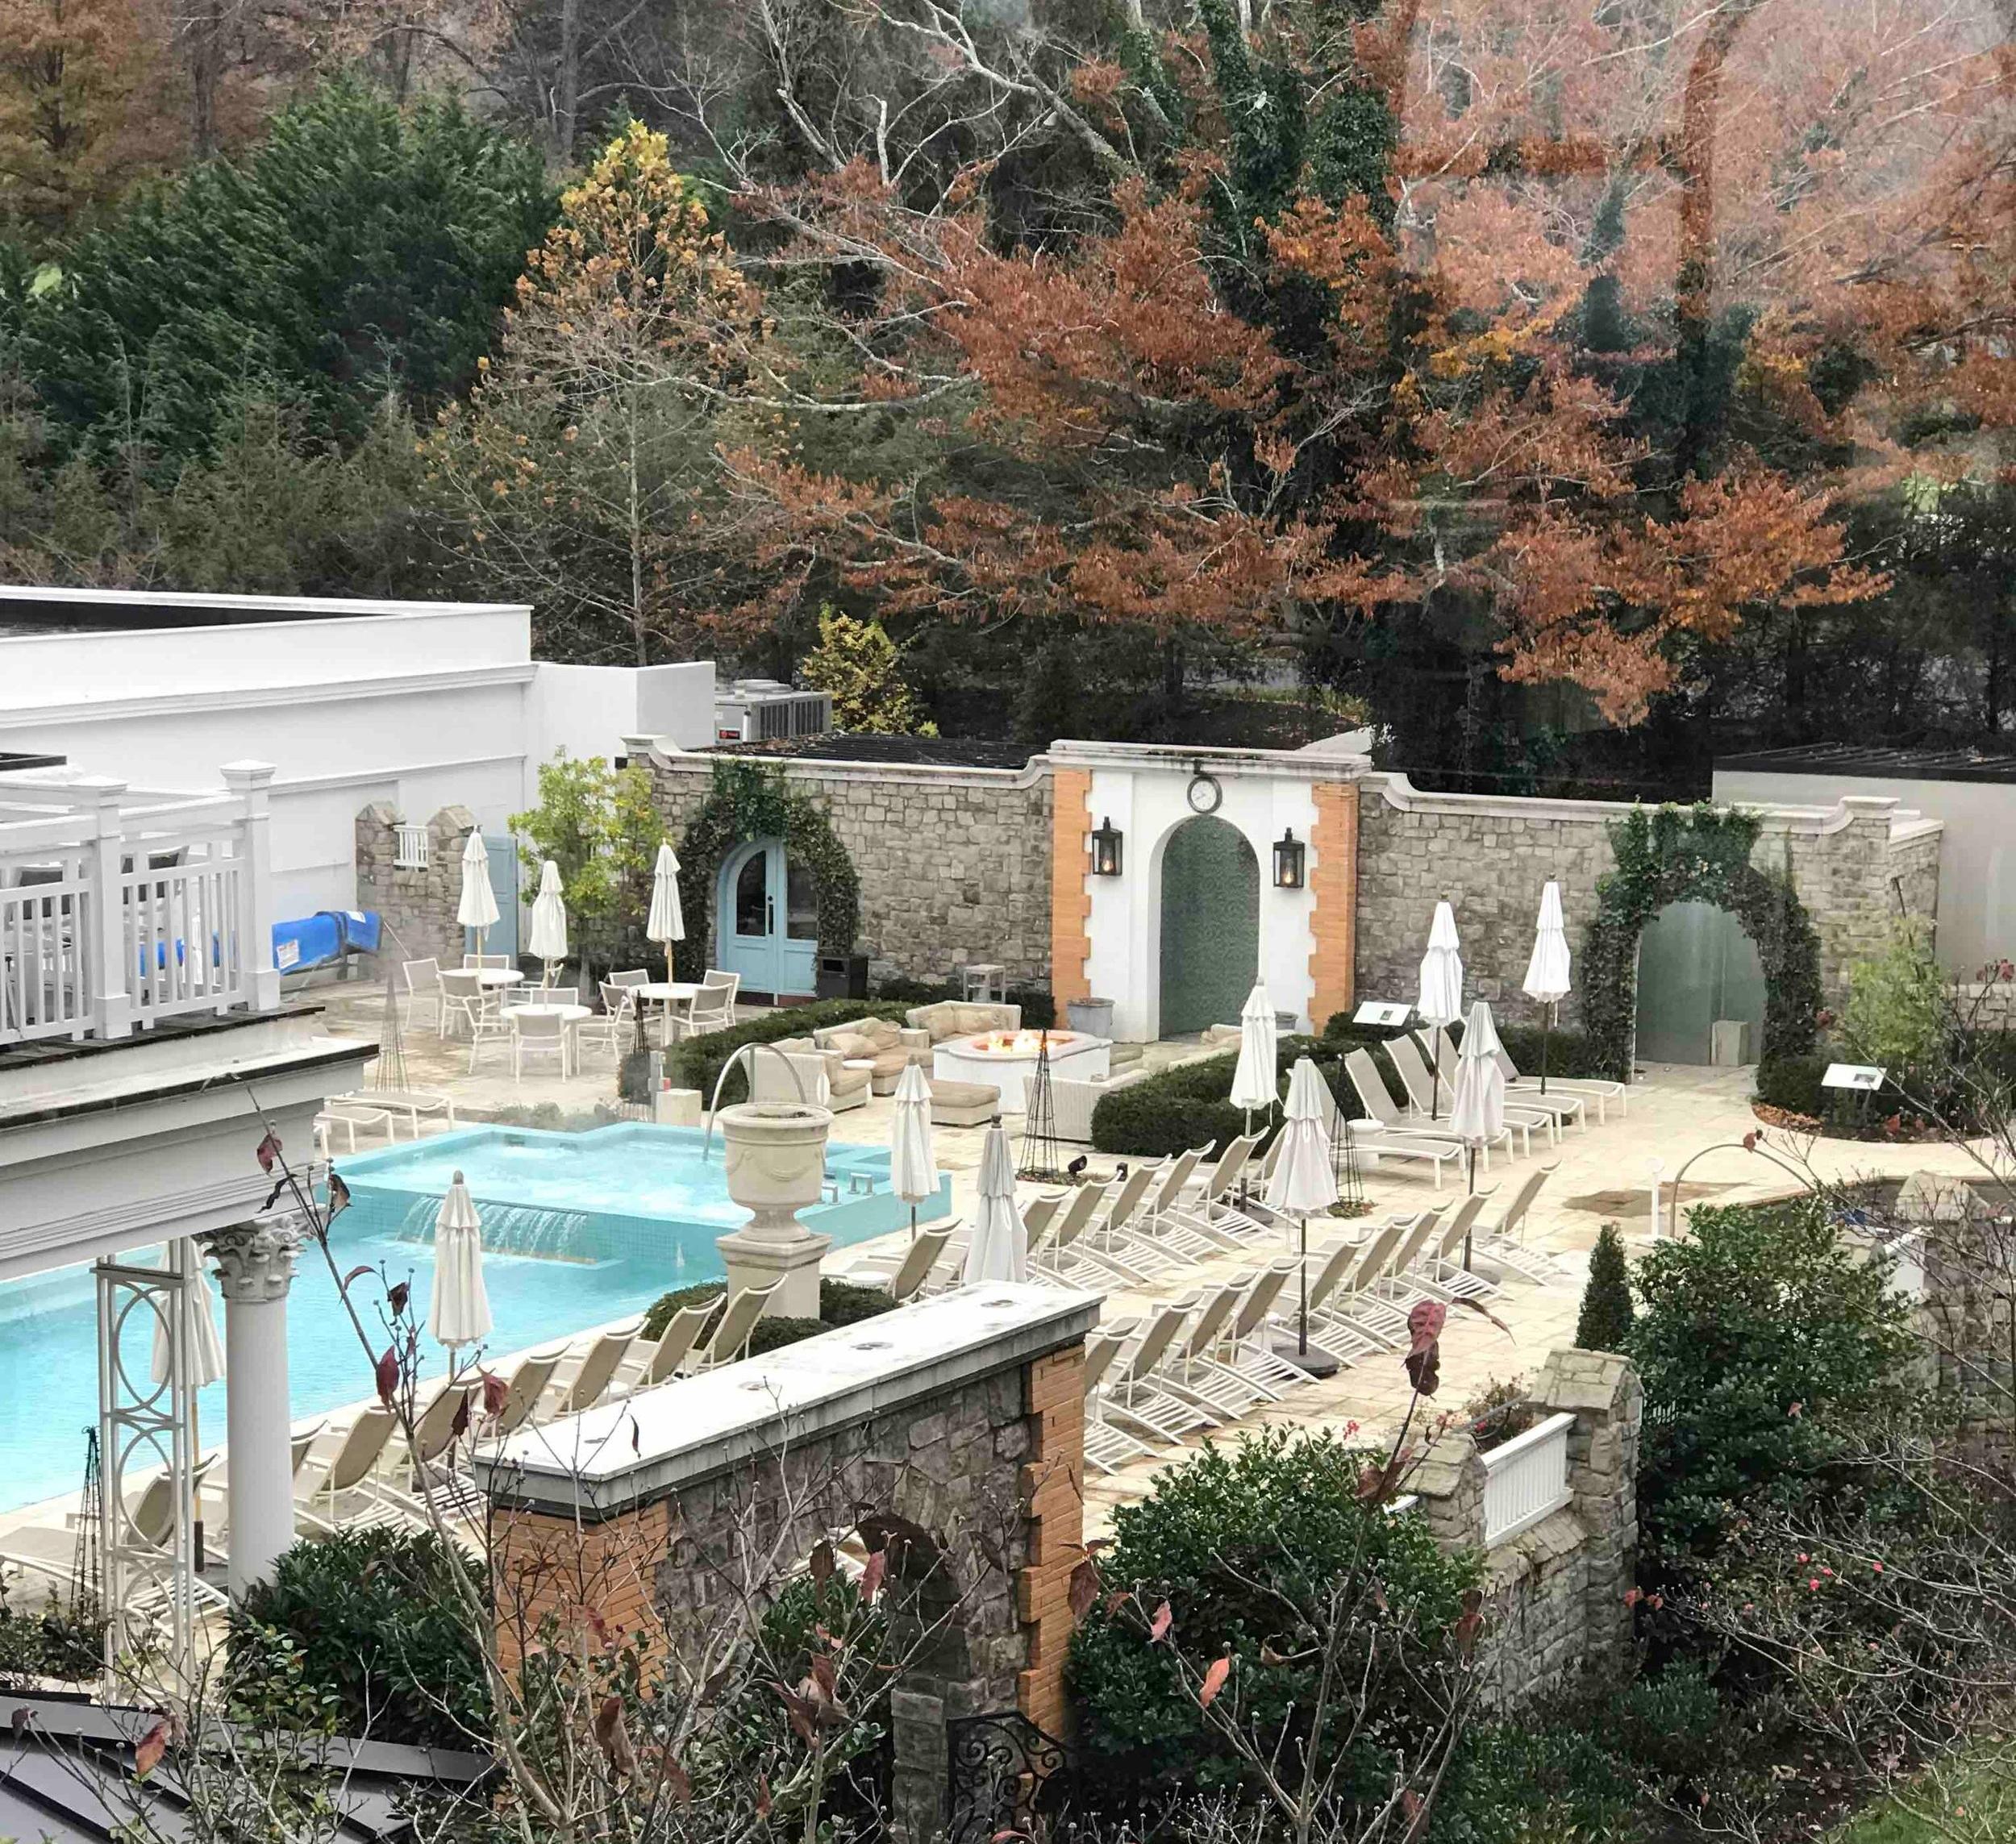 Pool+and+Hot+Springs%2C+Omni+Homestead+Hotel+VA.jpg